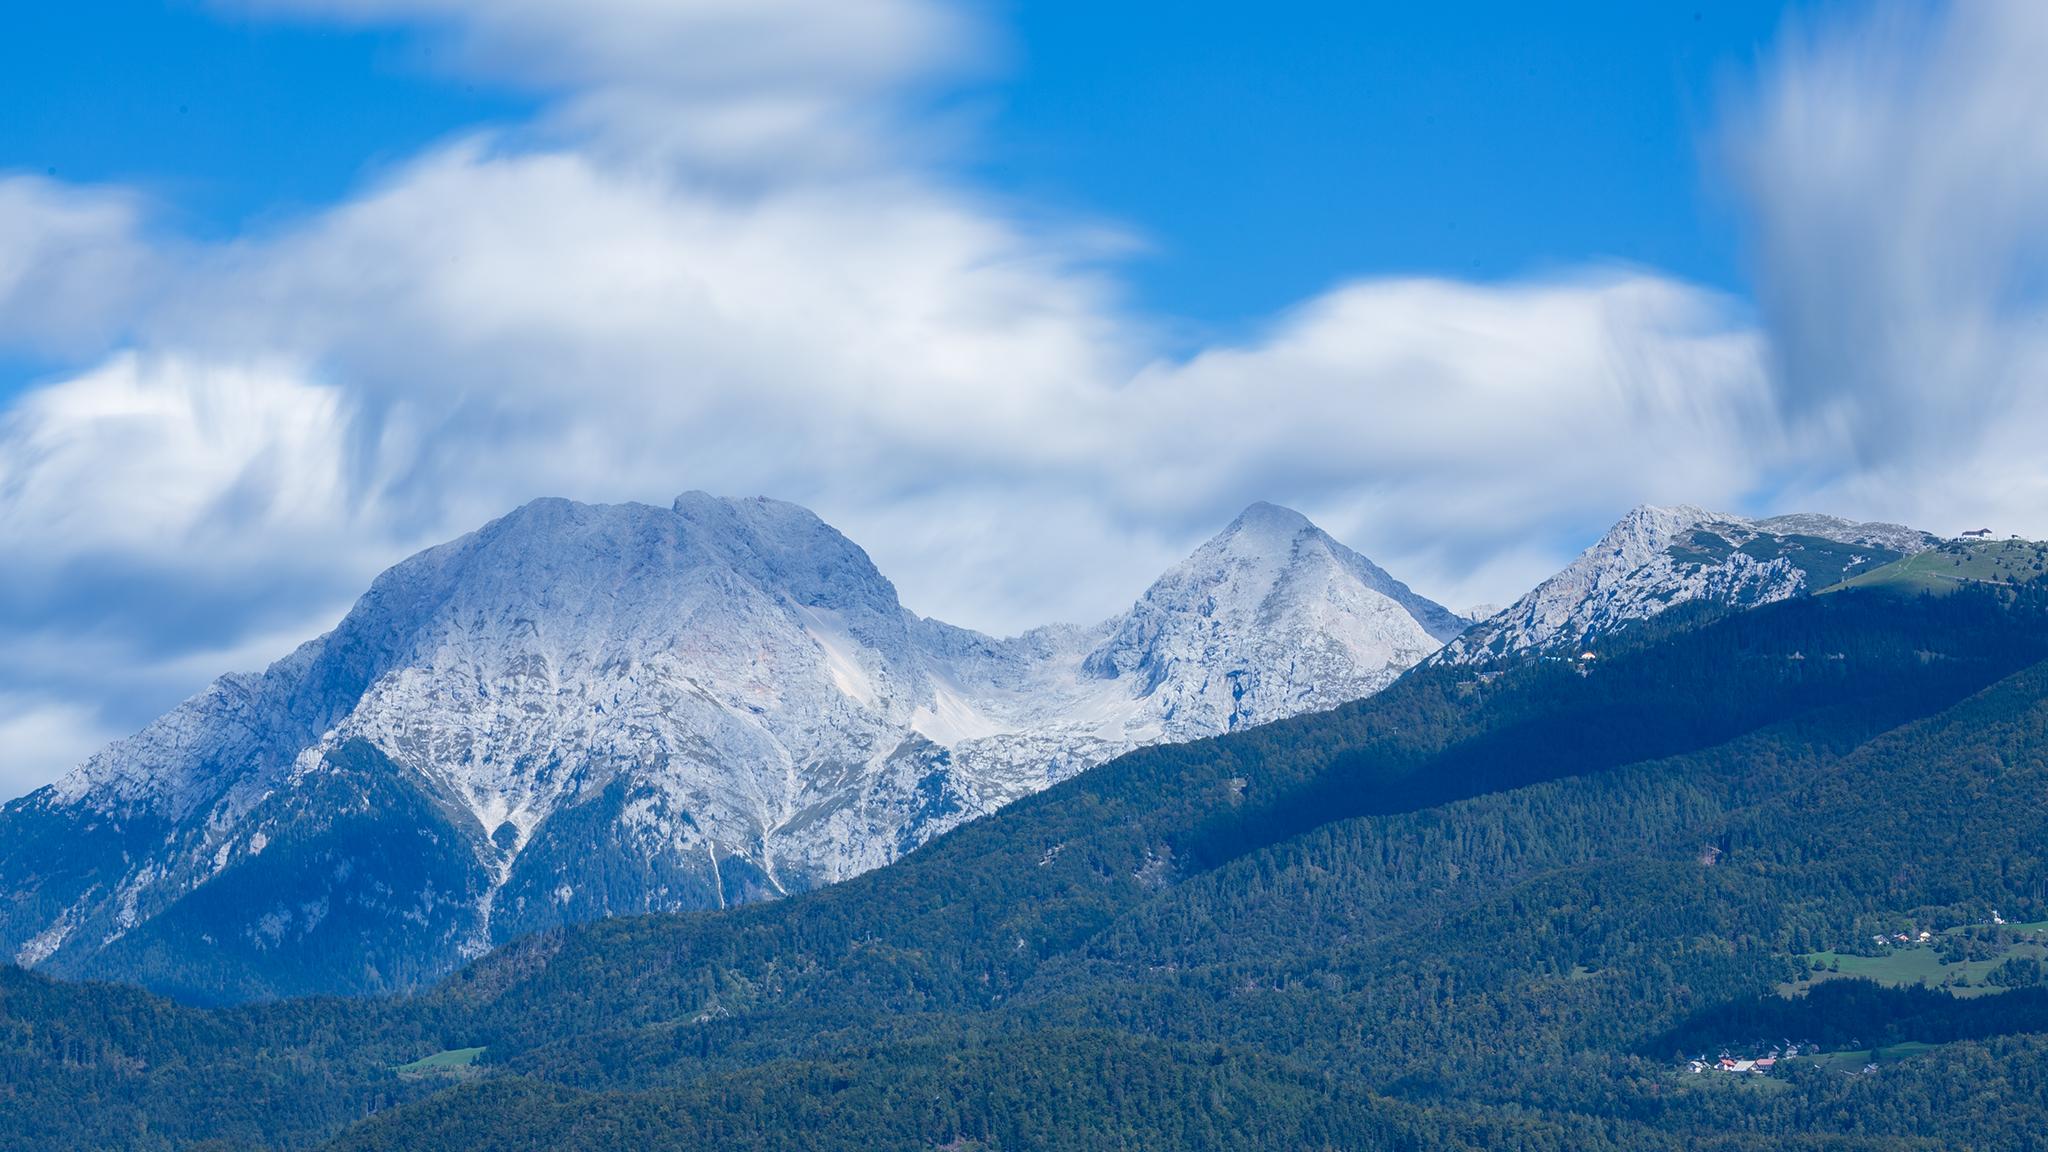 Mt Grintovec, the highest peak in the Kamnik Alps, Slovenia.